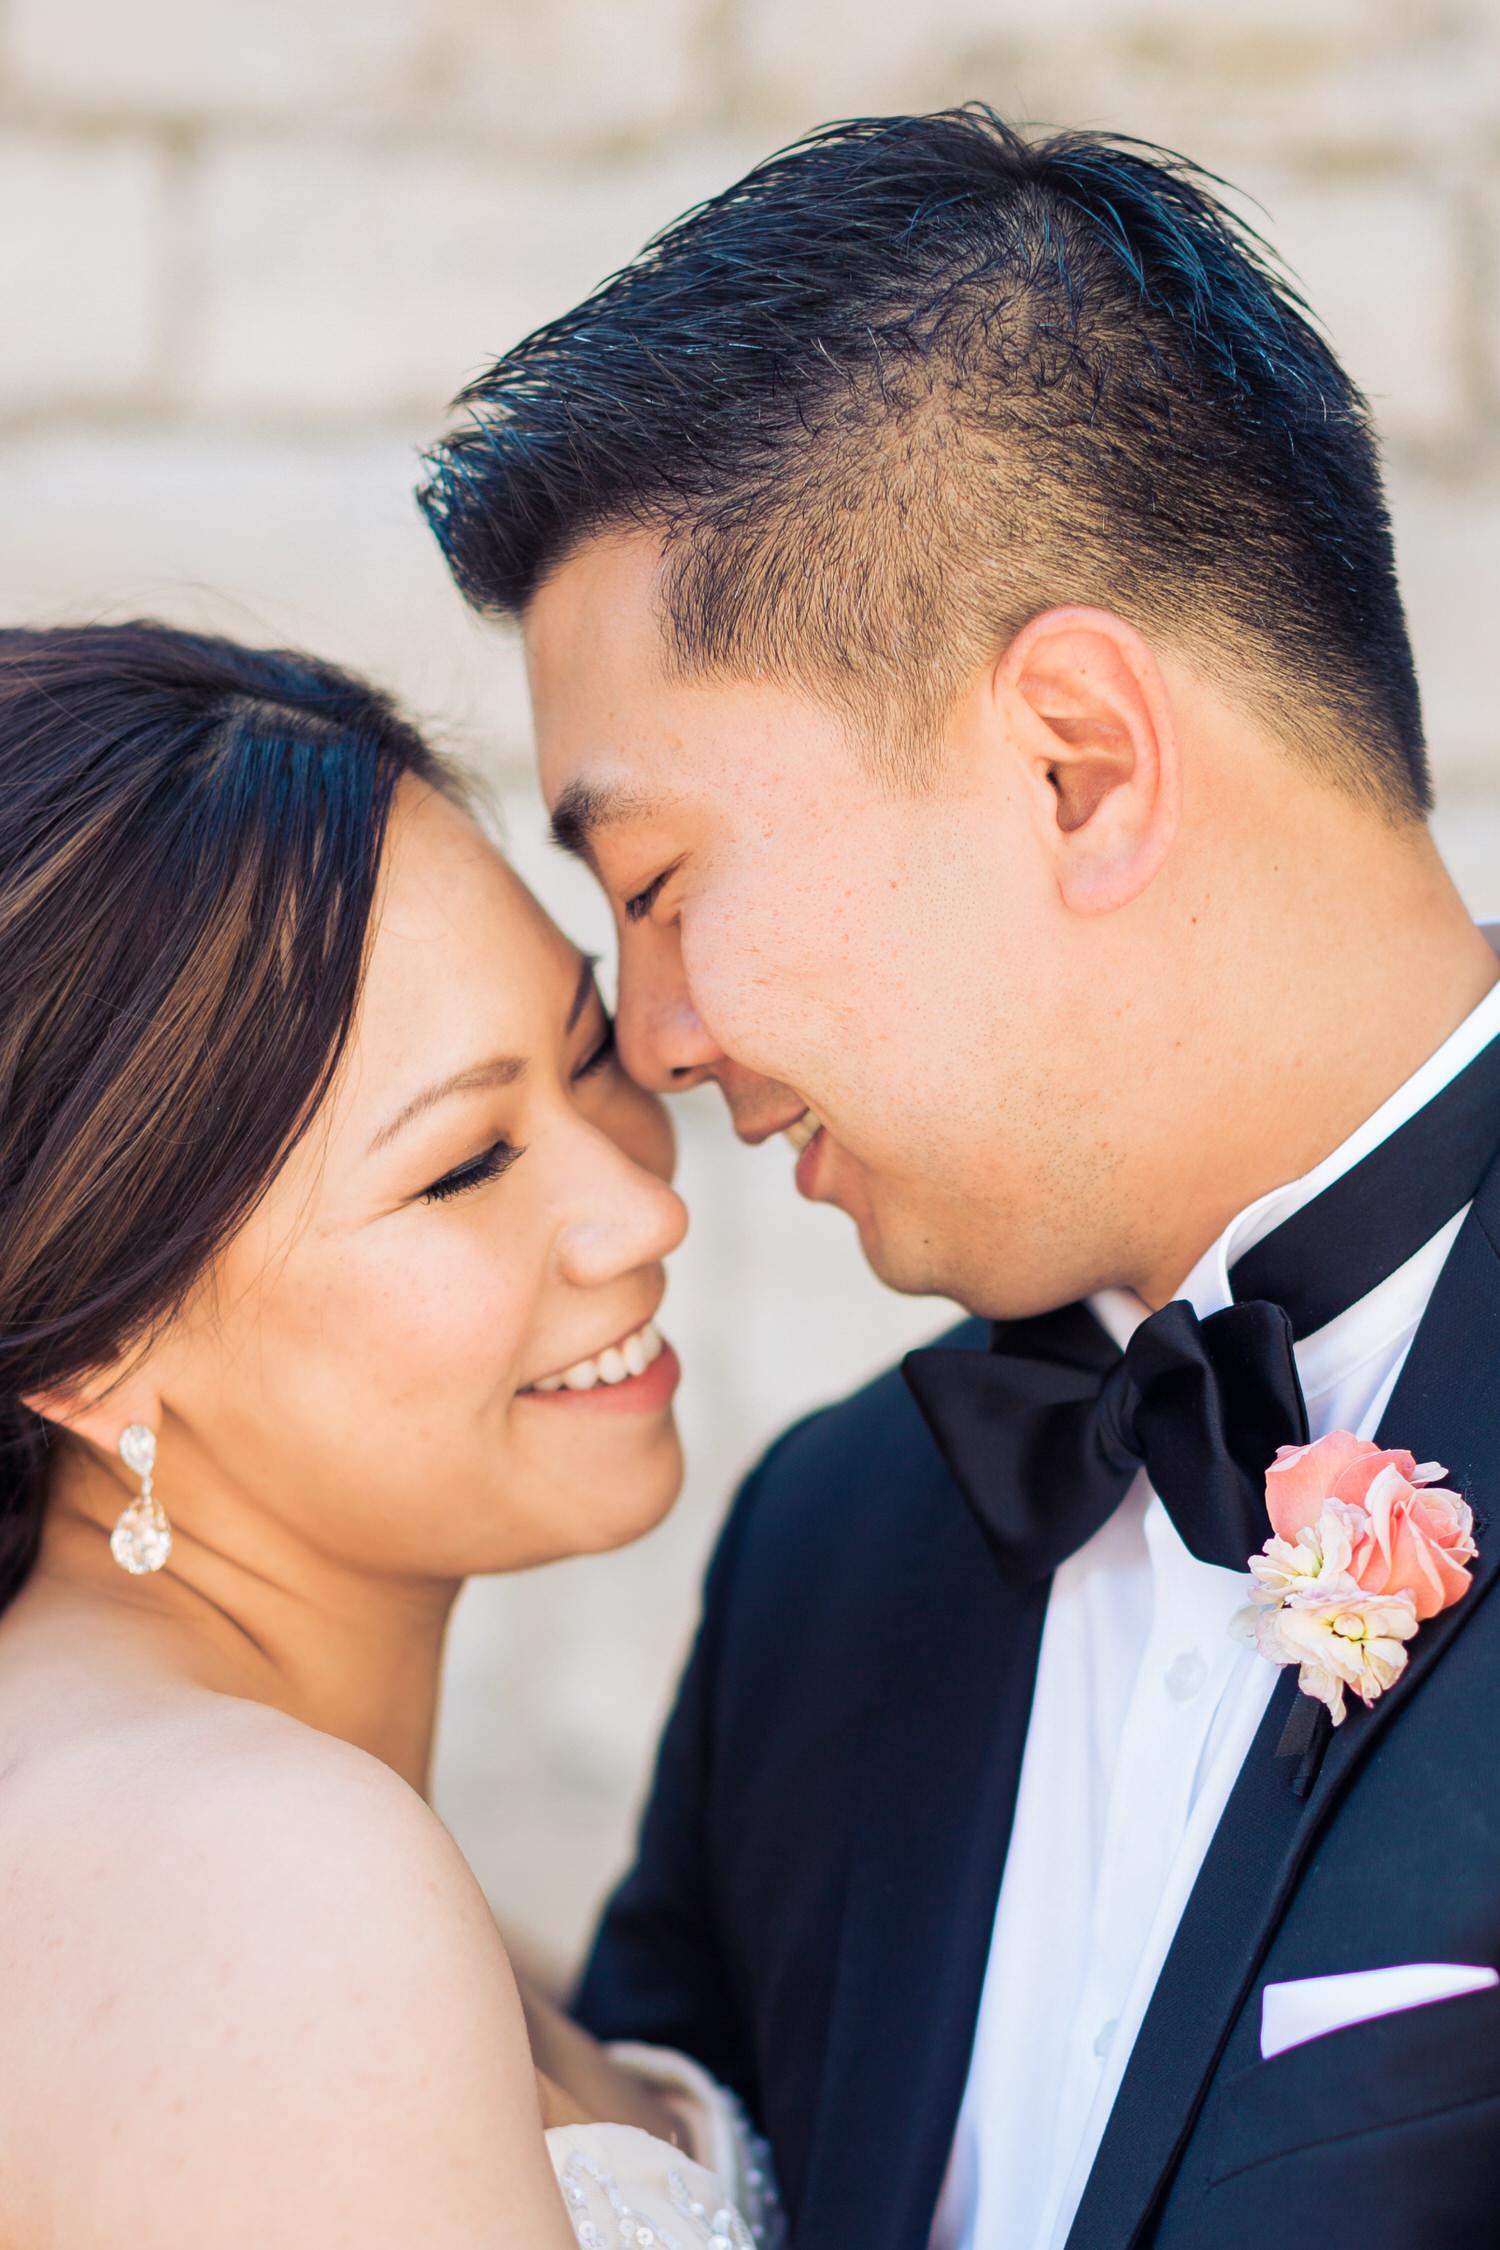 yeung wedding-29.jpg